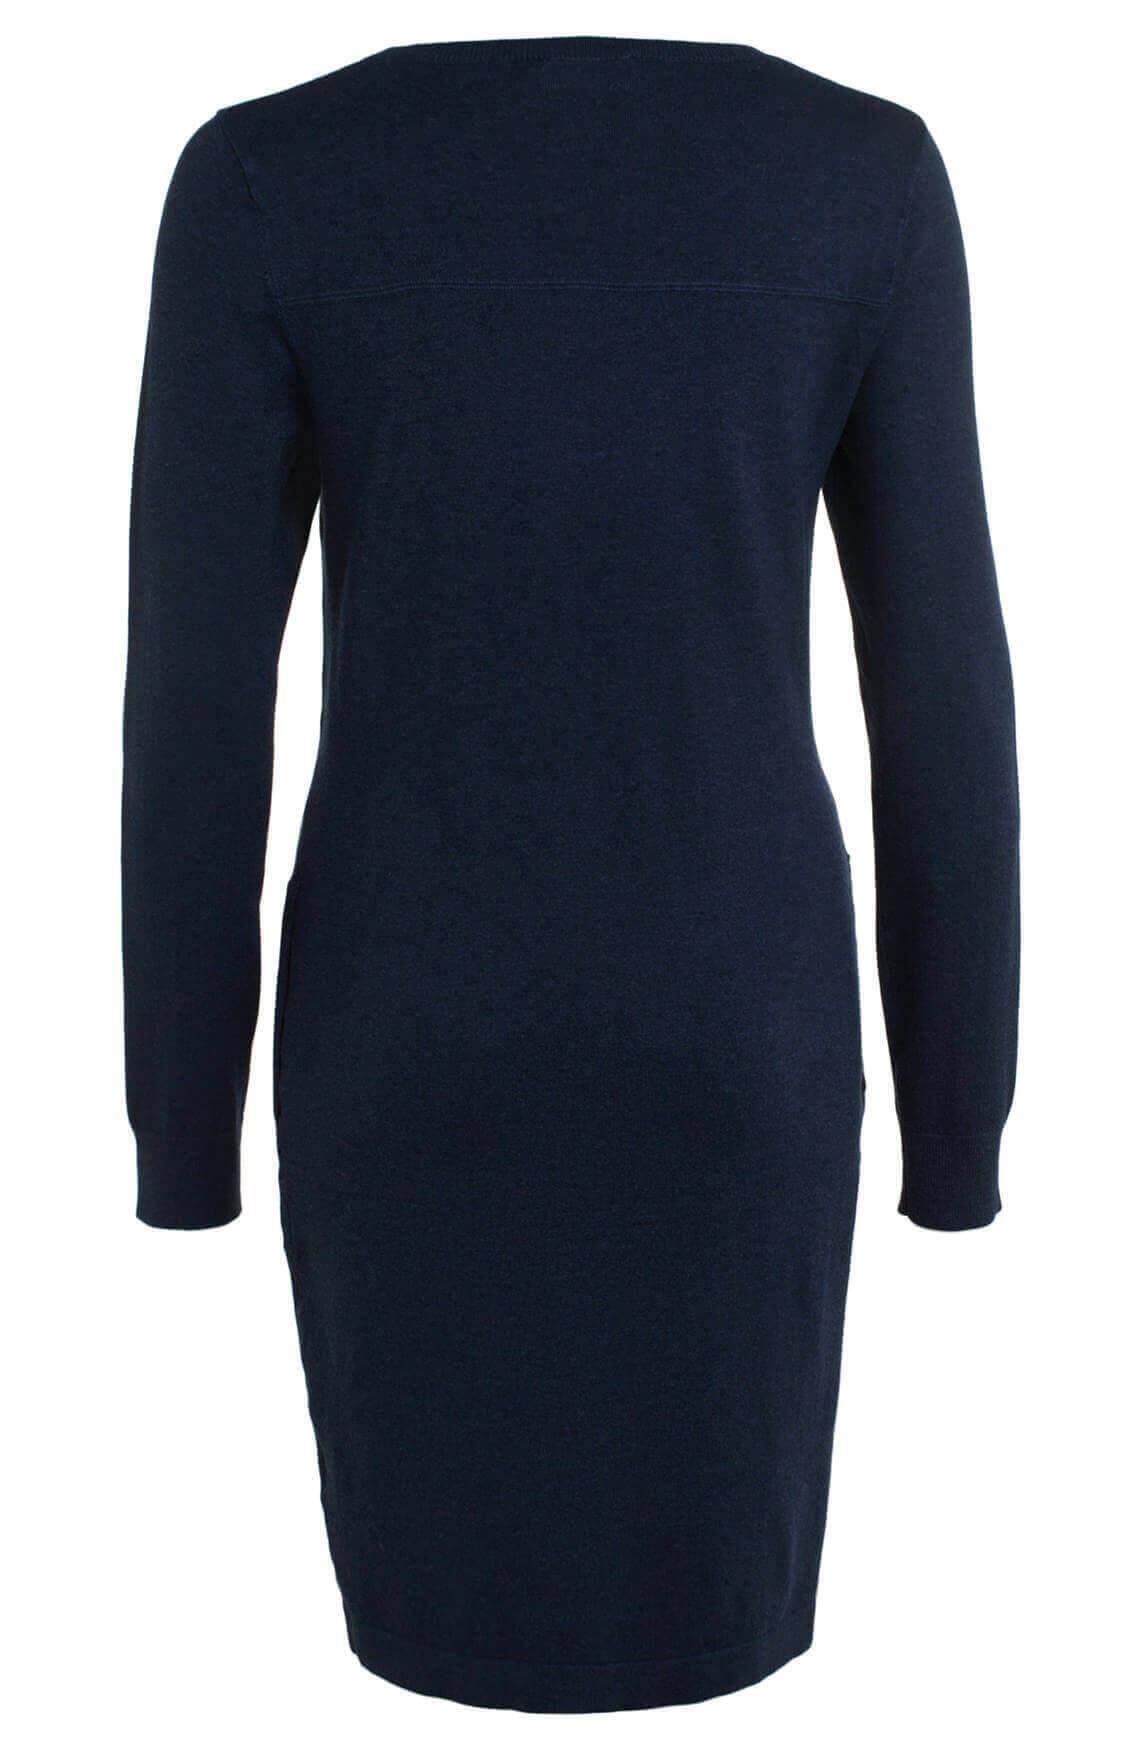 Anna Dames Fijngebreide jurk Blauw